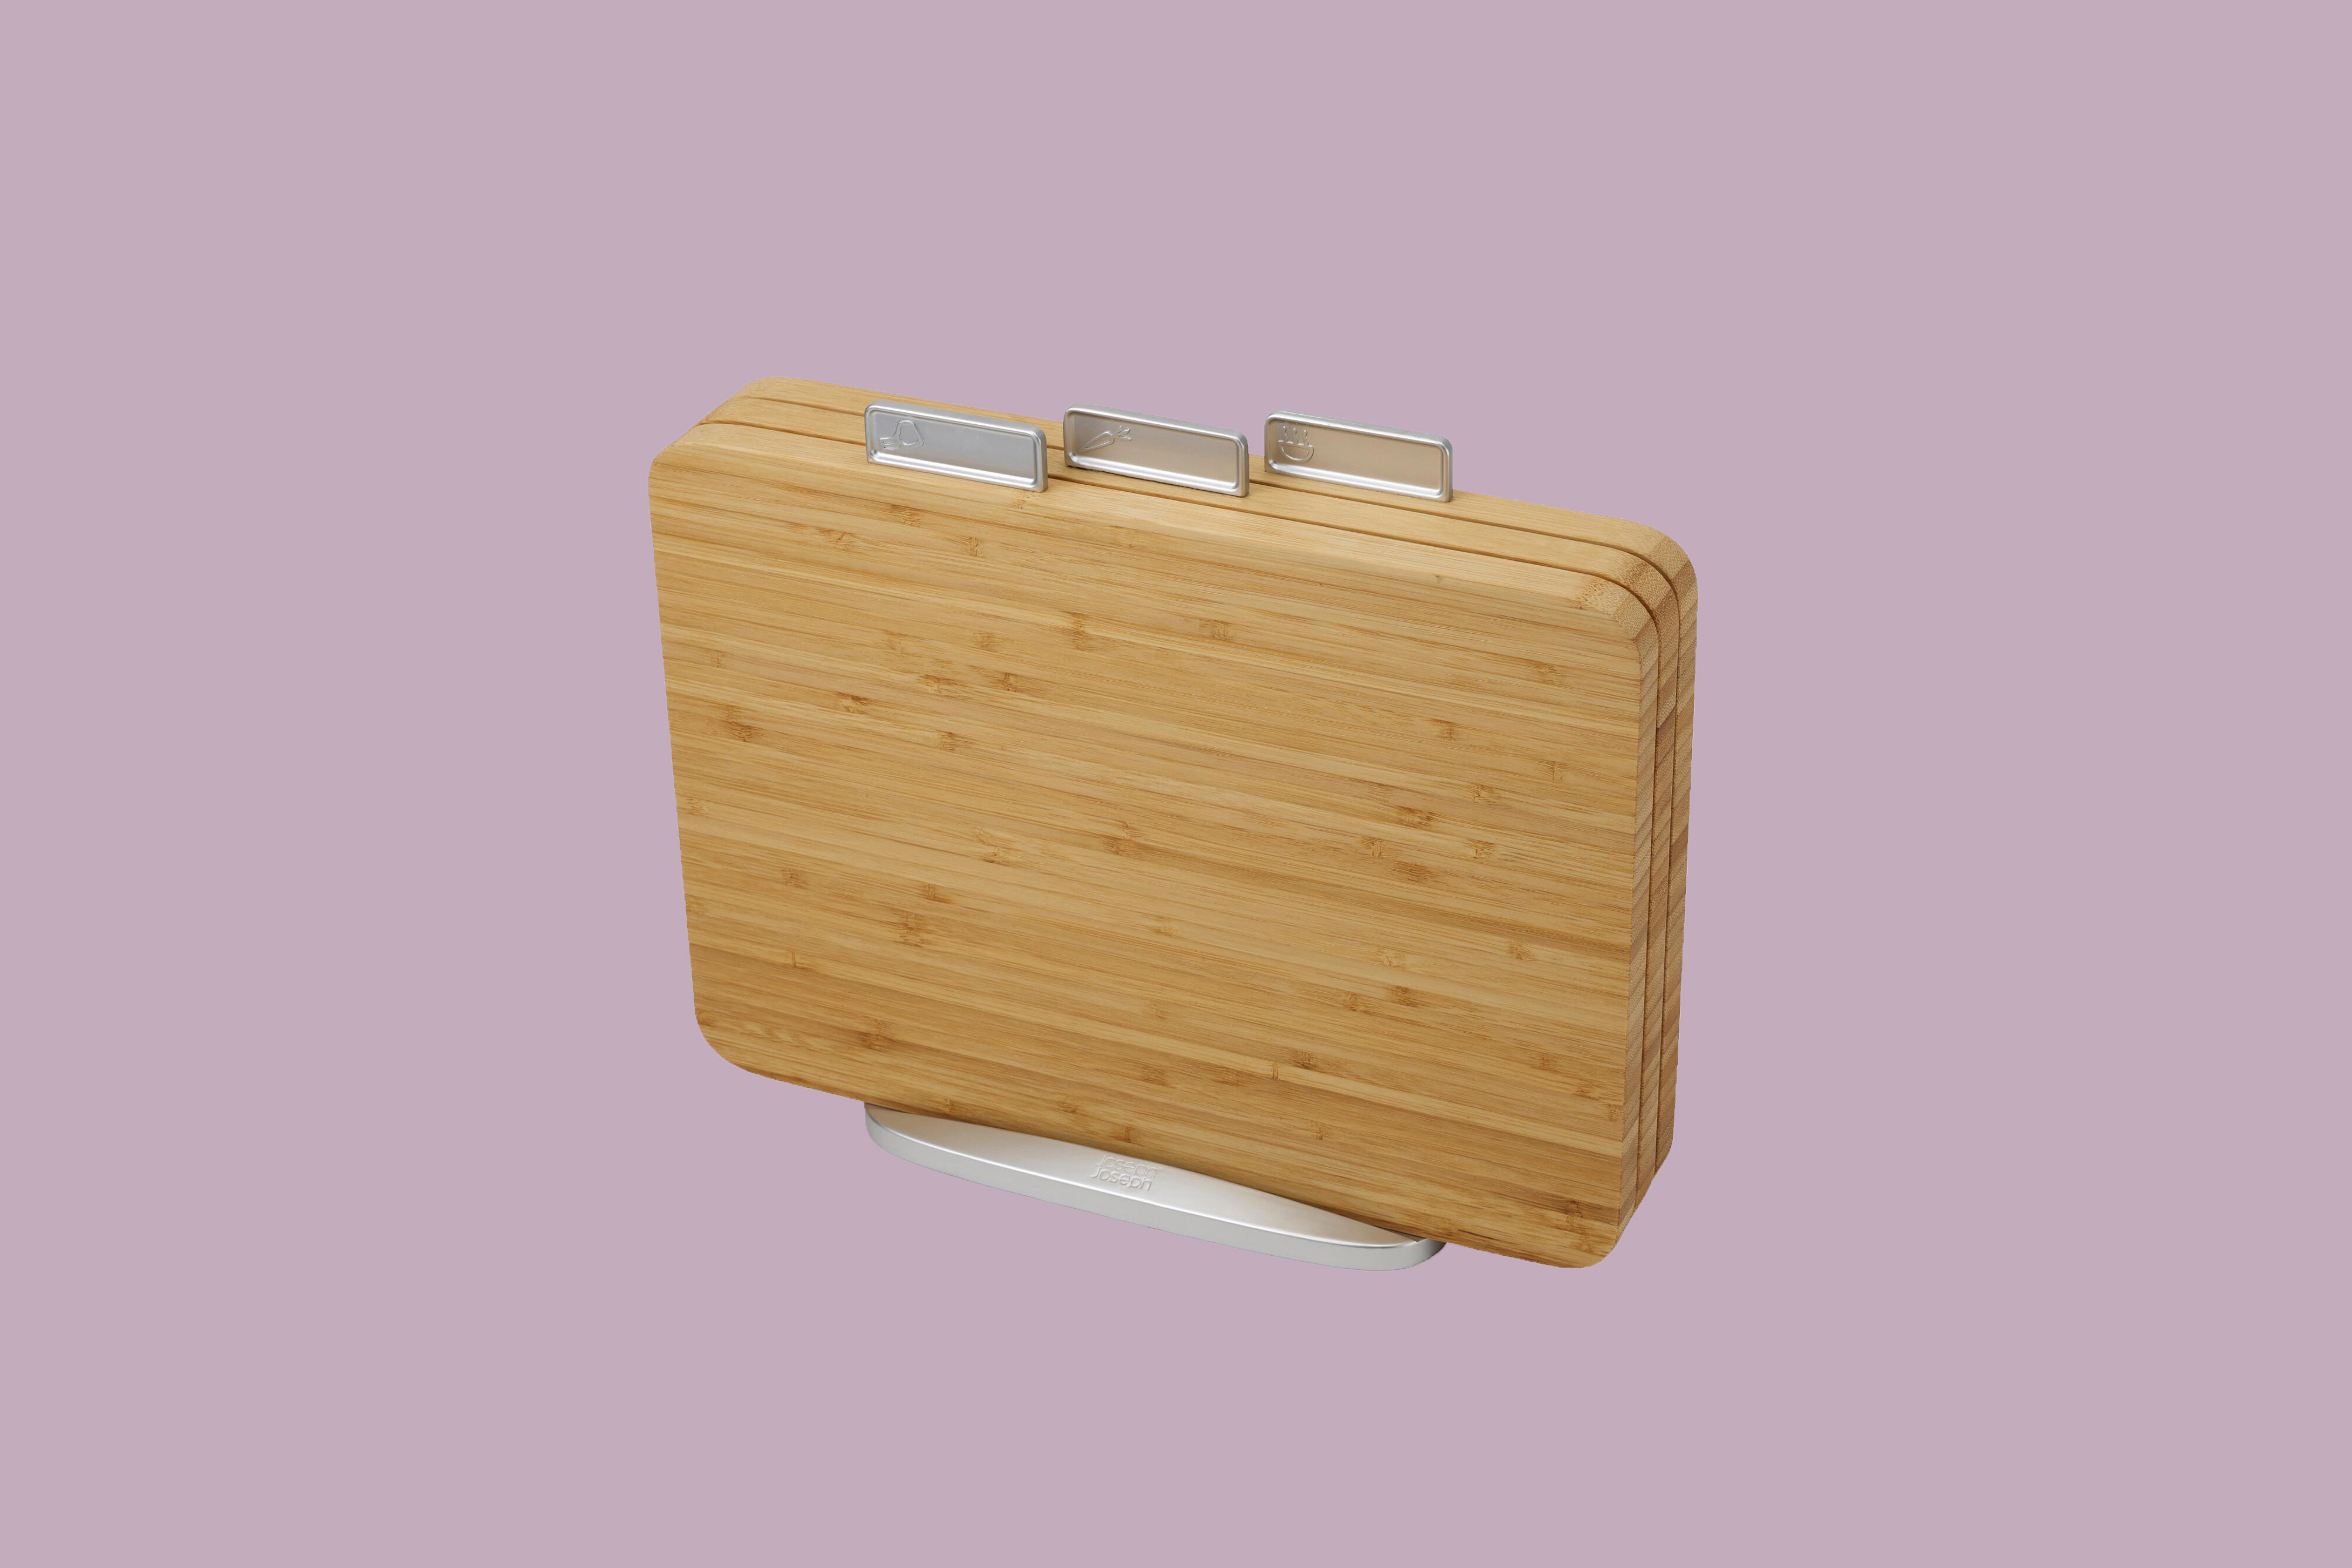 Joseph Index 4 Piece Bamboo Cutting Board Set